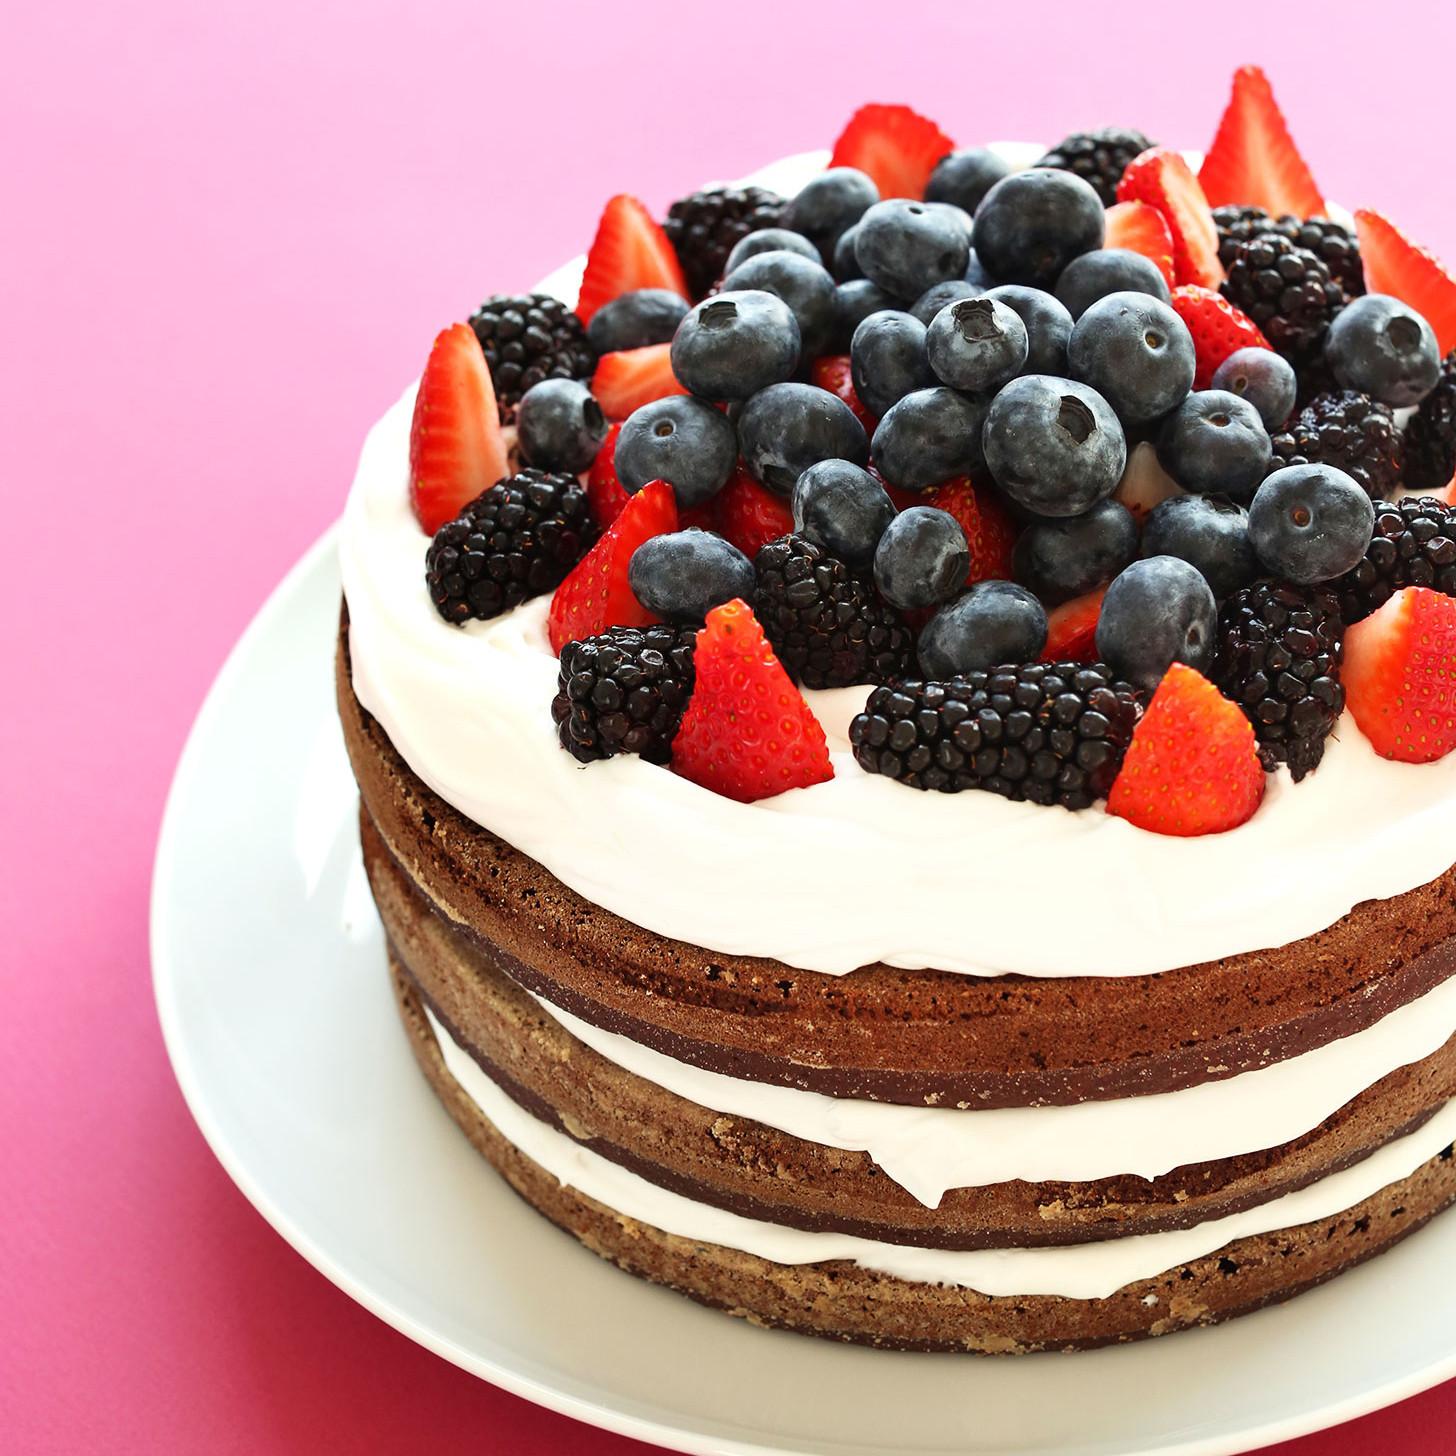 Memorial Day Desserts Ideas  10 Memorial Day Desserts That Will Brighten Up Your